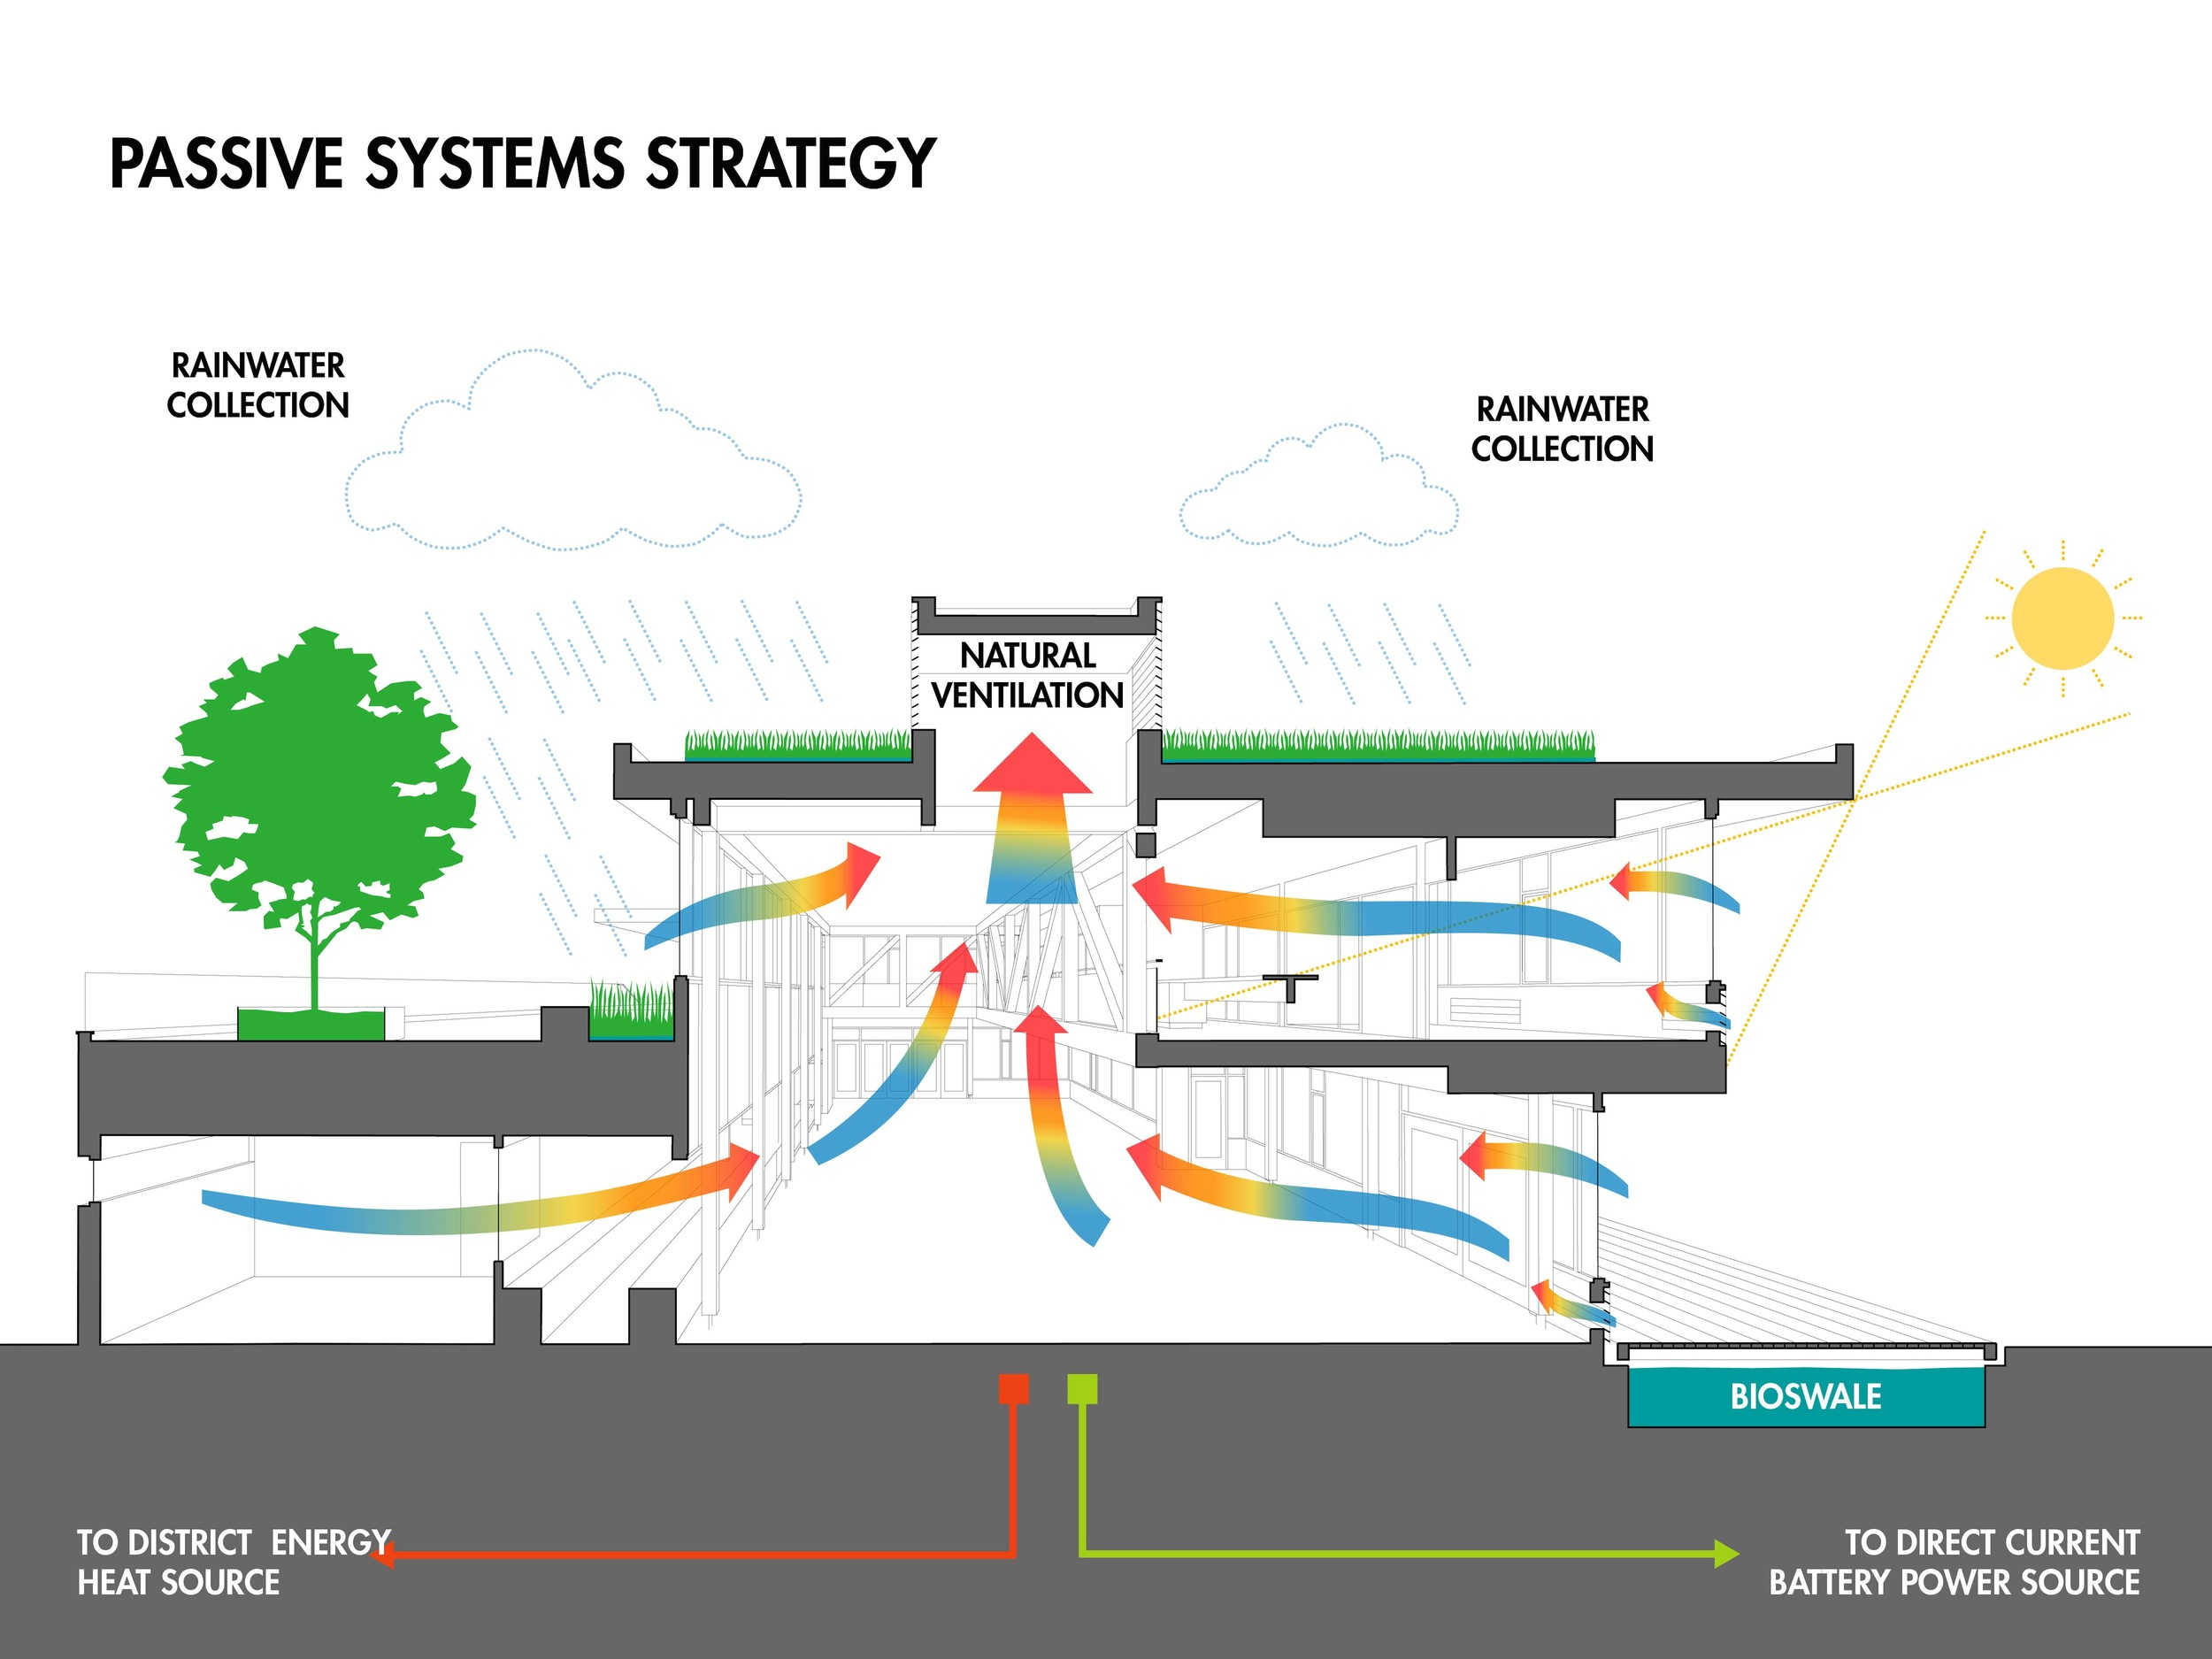 ESC Passive Systems Strategy Diagram.jpg